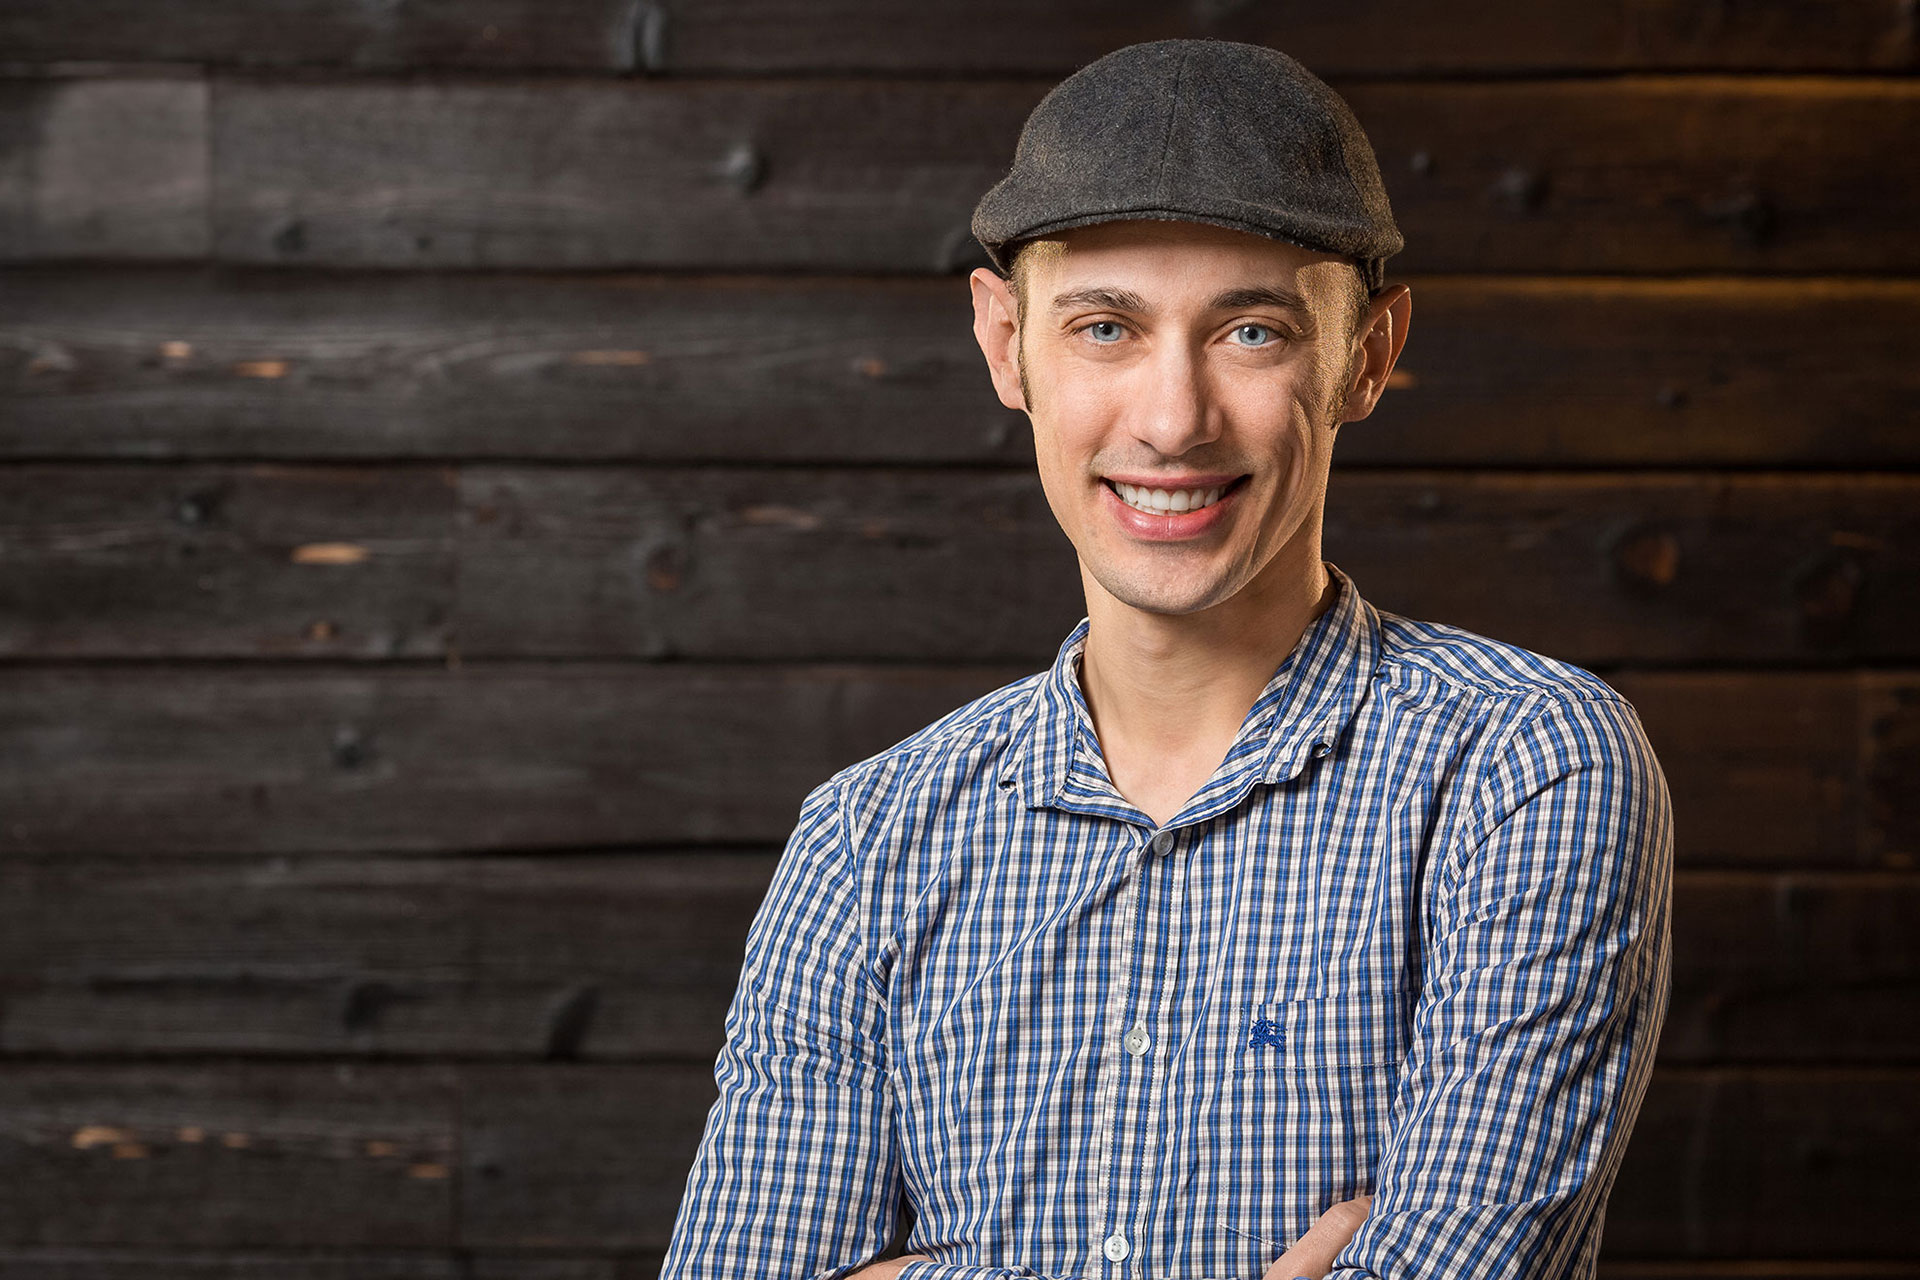 Tobias Lutke, CEO of Shopify